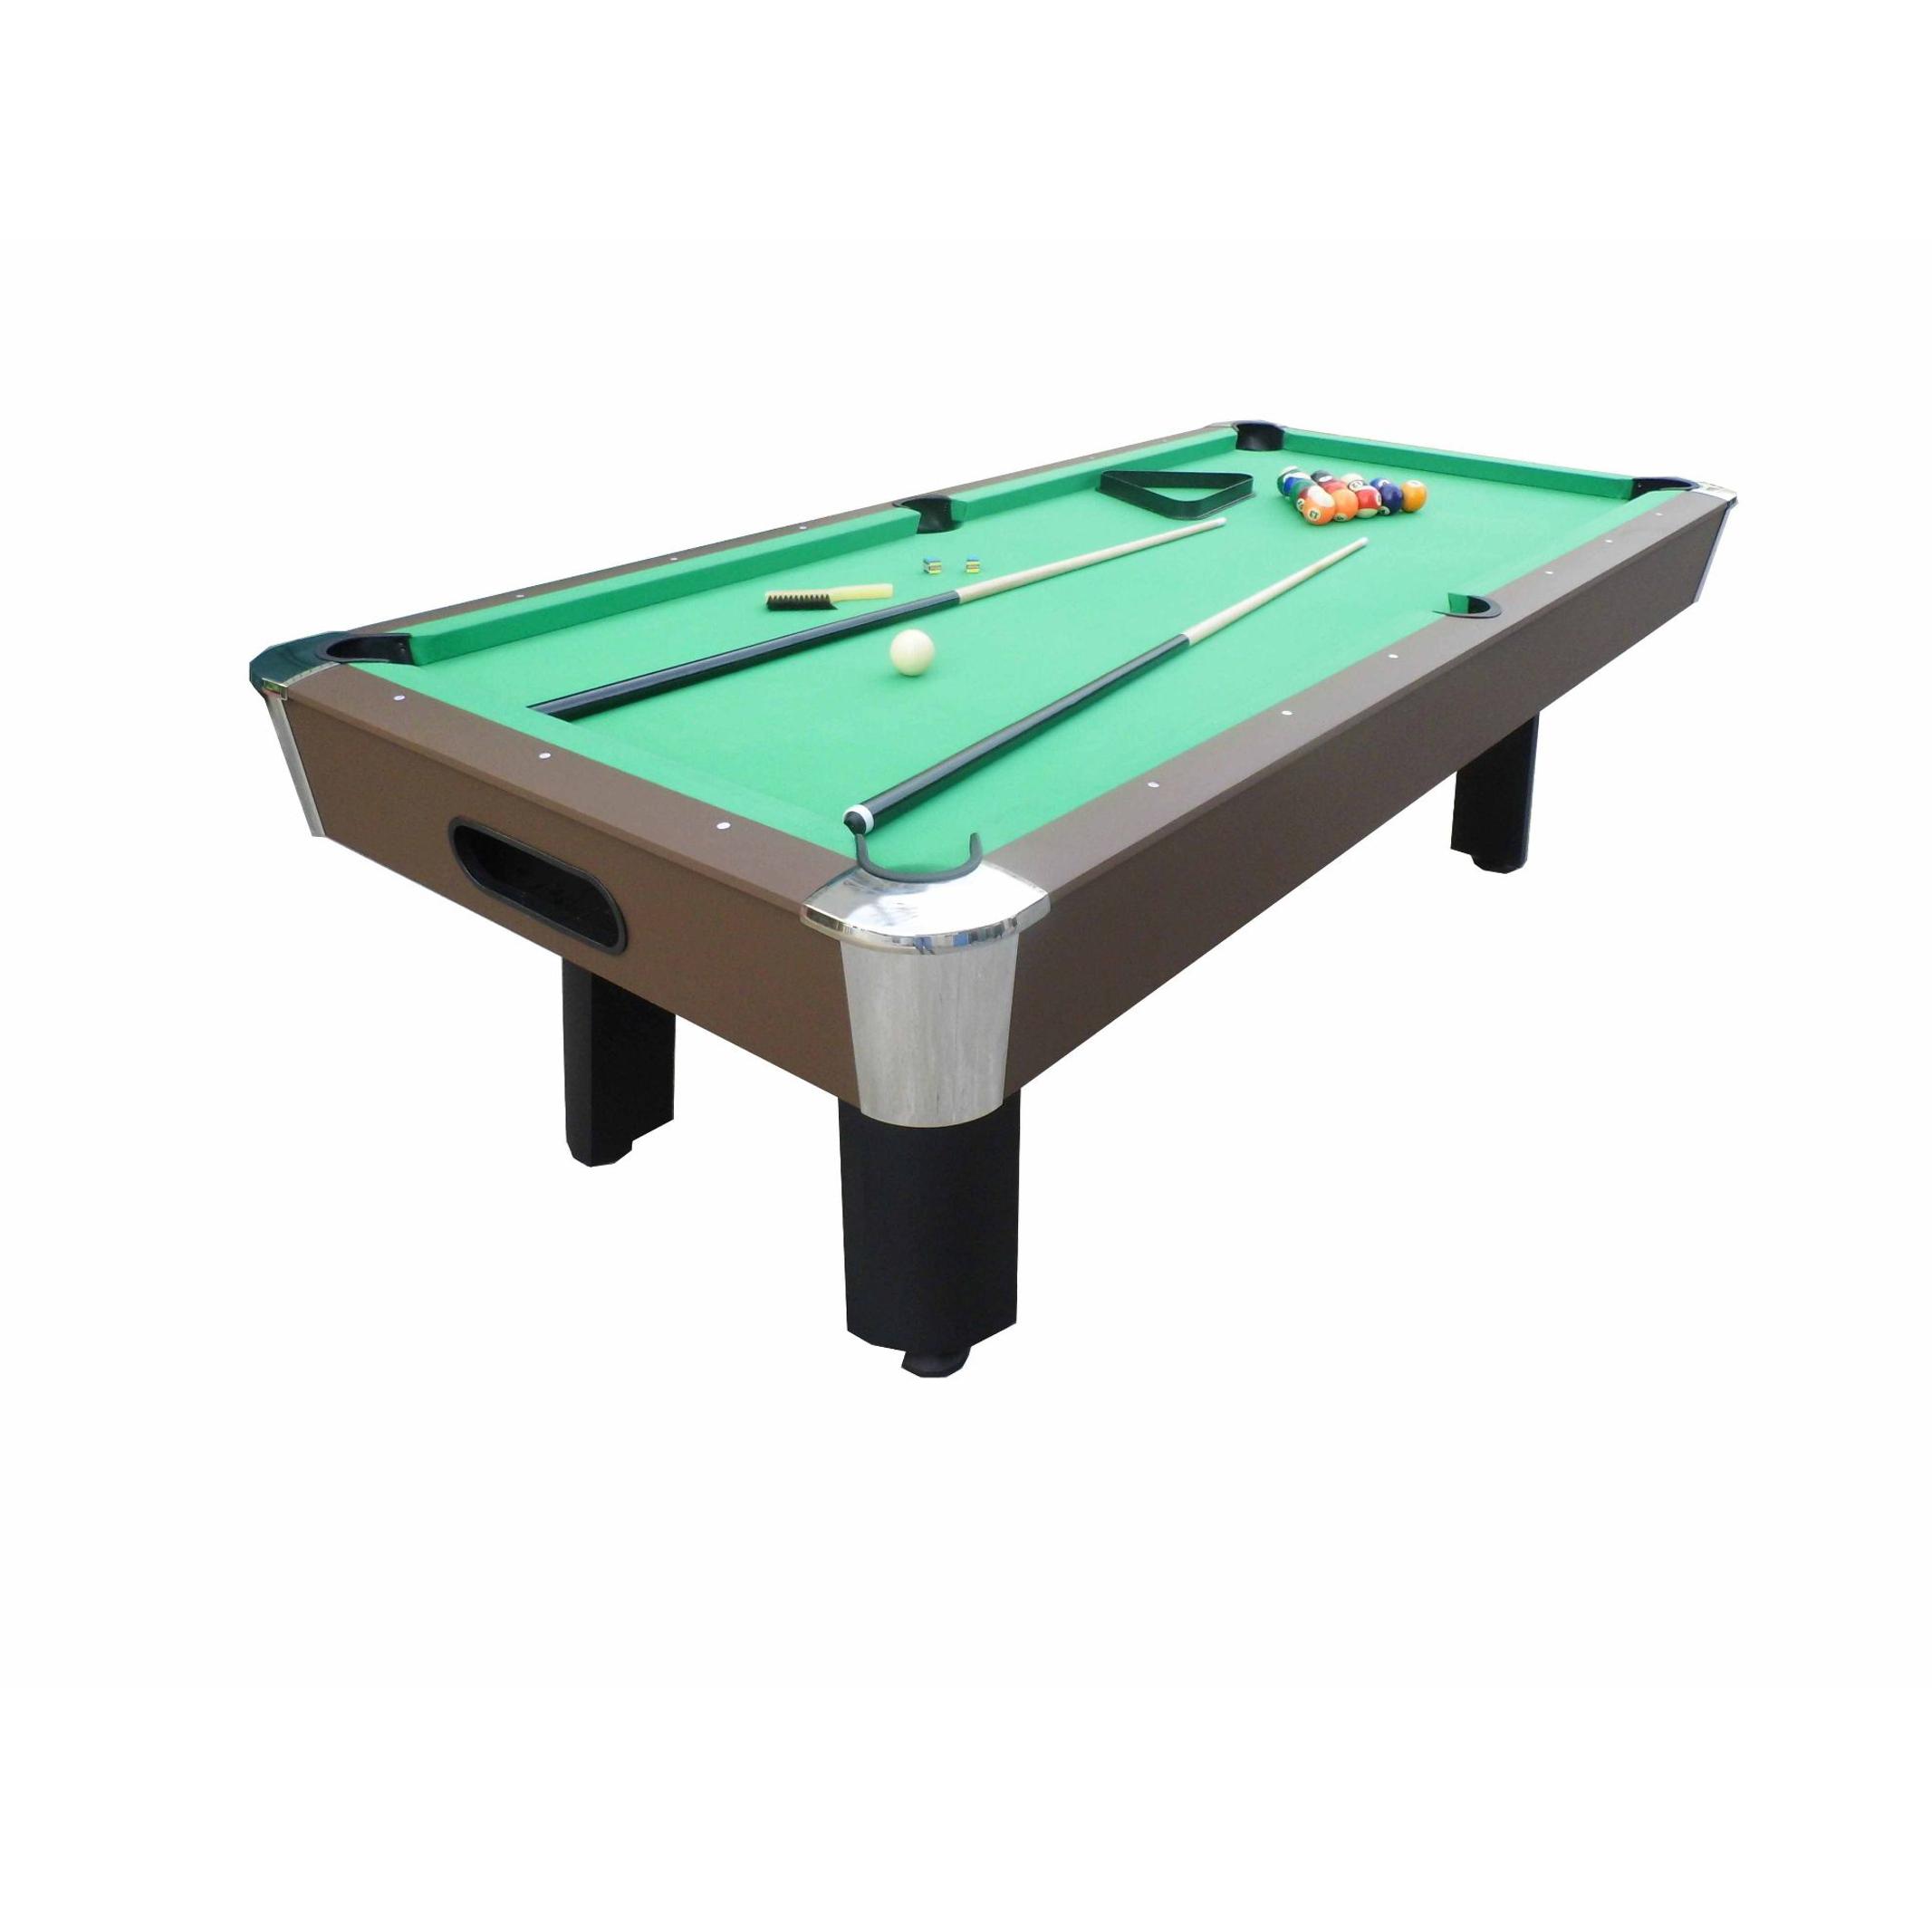 Sportcraft 7 Ft. Arlington Green Billiard Table